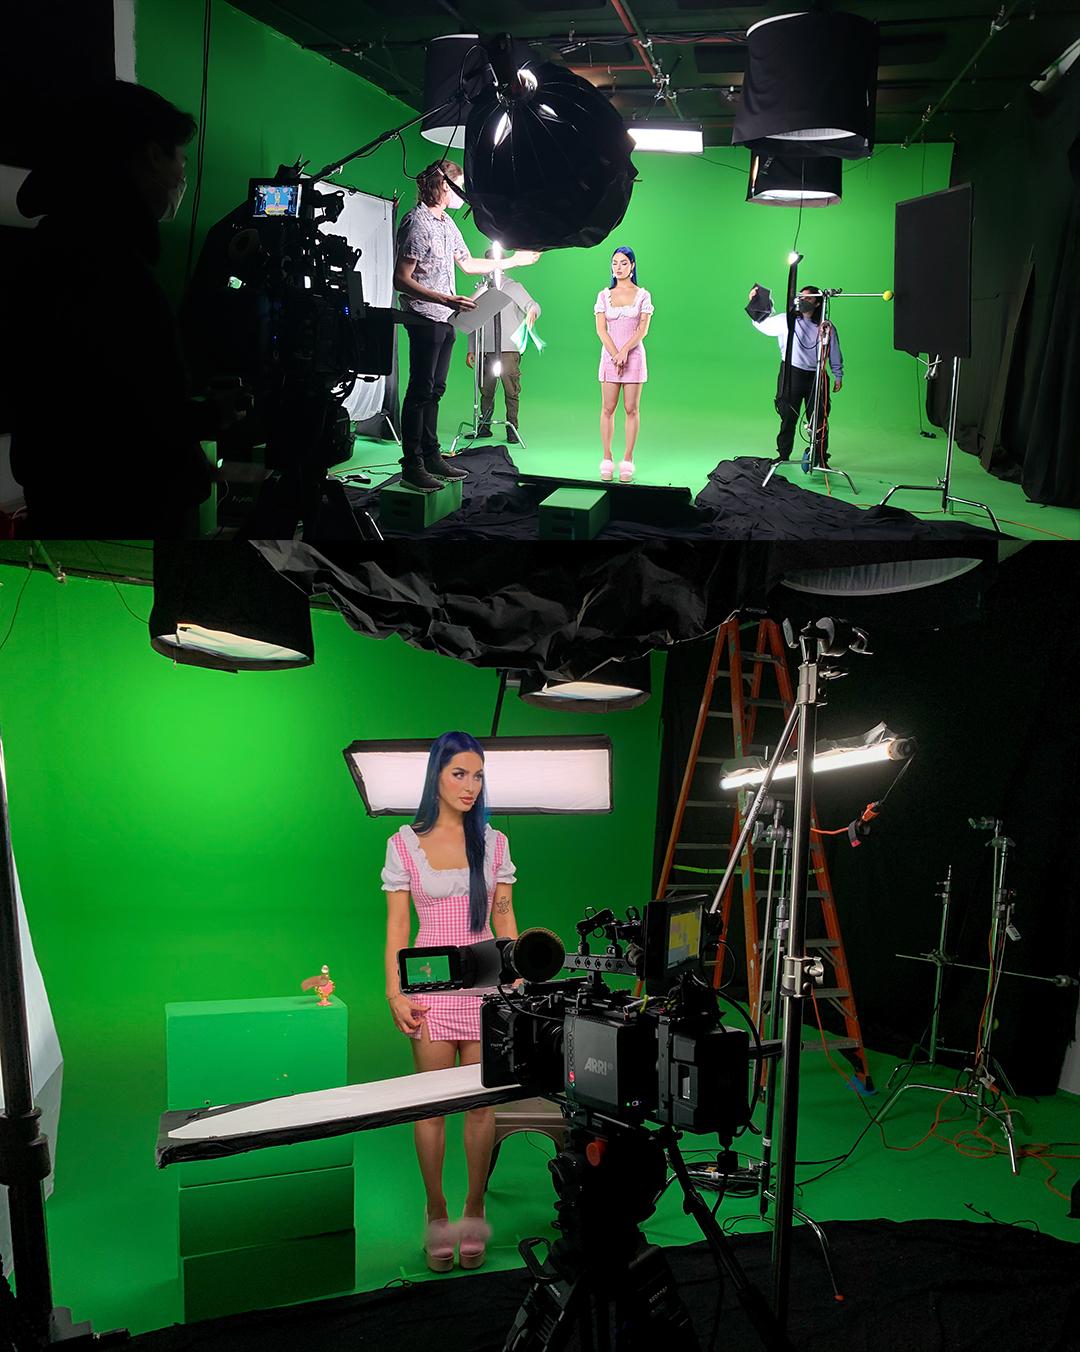 behind the scenes on set greenscreen studio shoot nyc